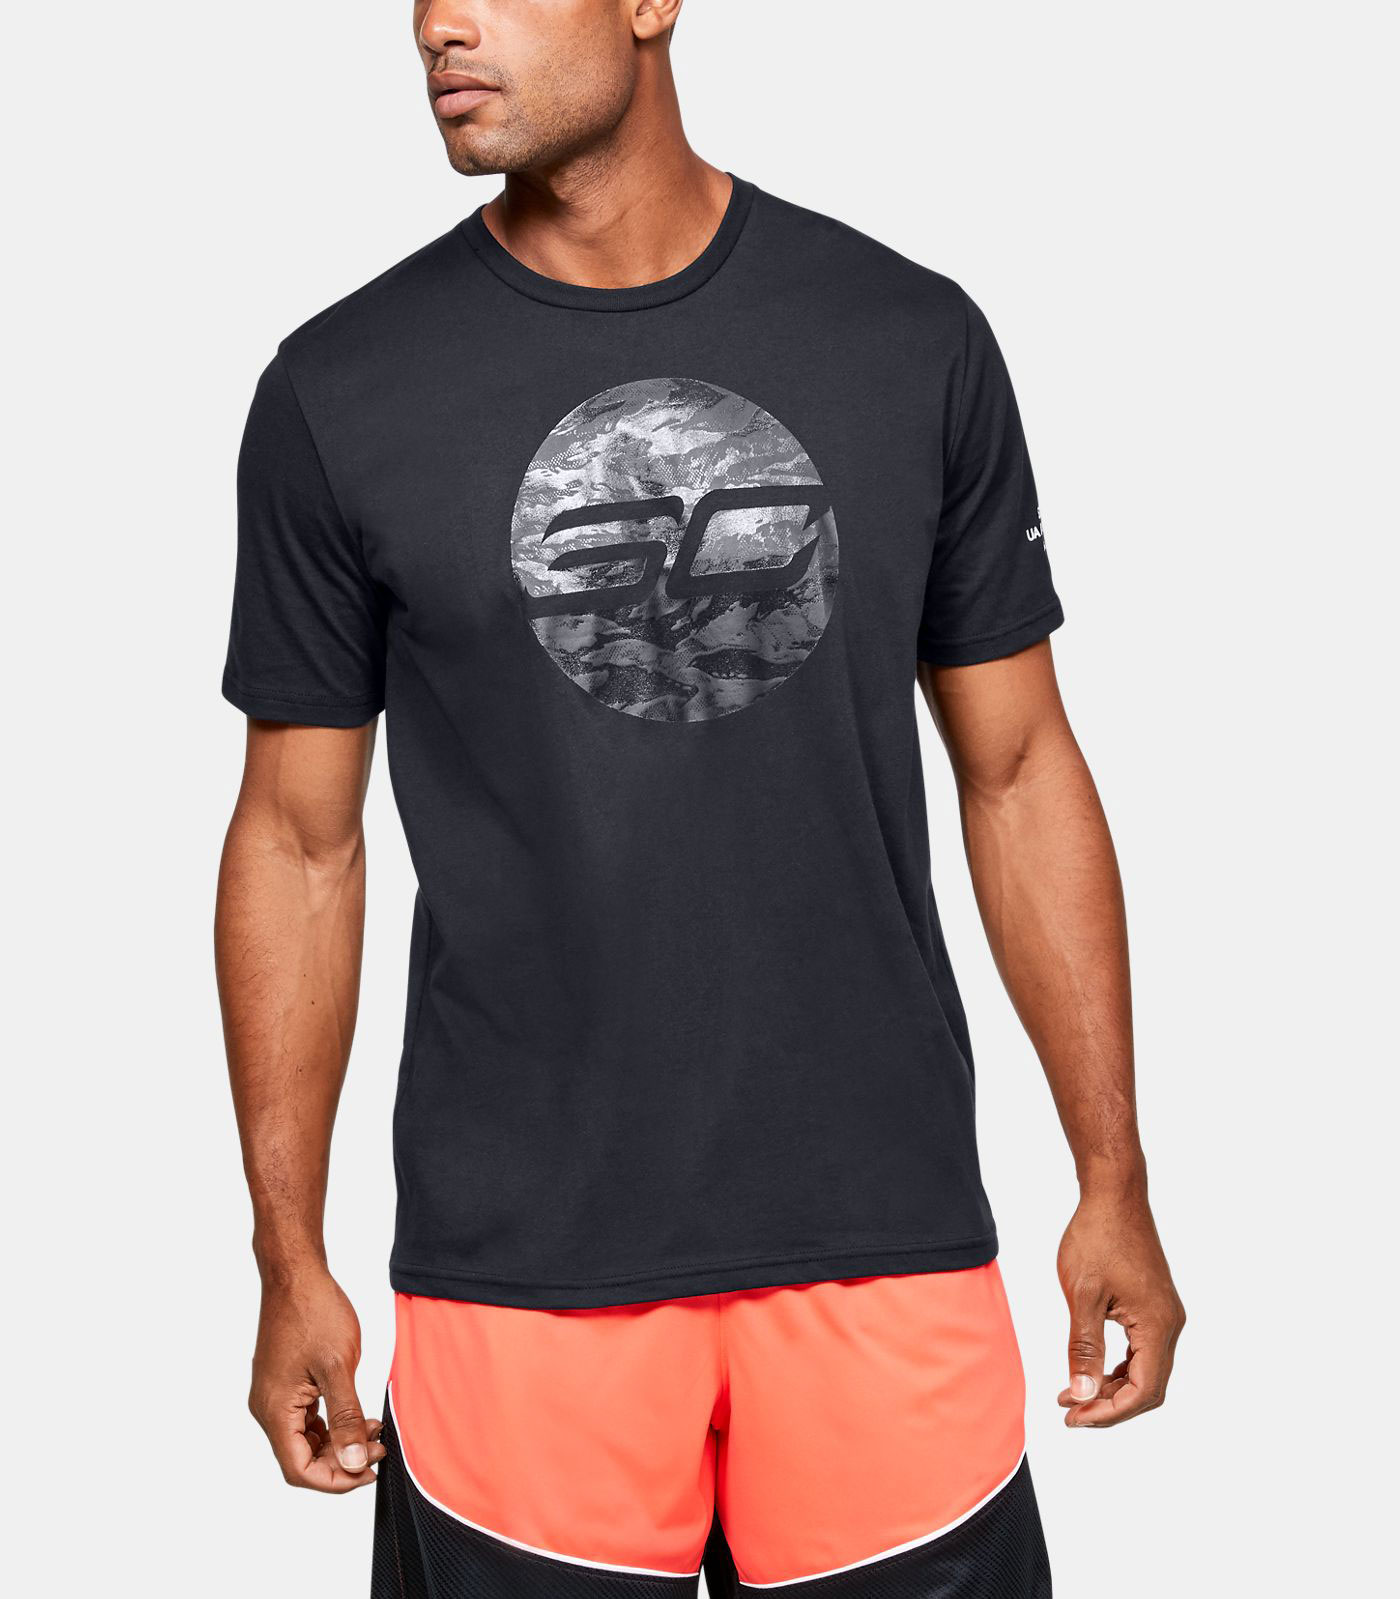 curry-7-t-shirt-black-grey